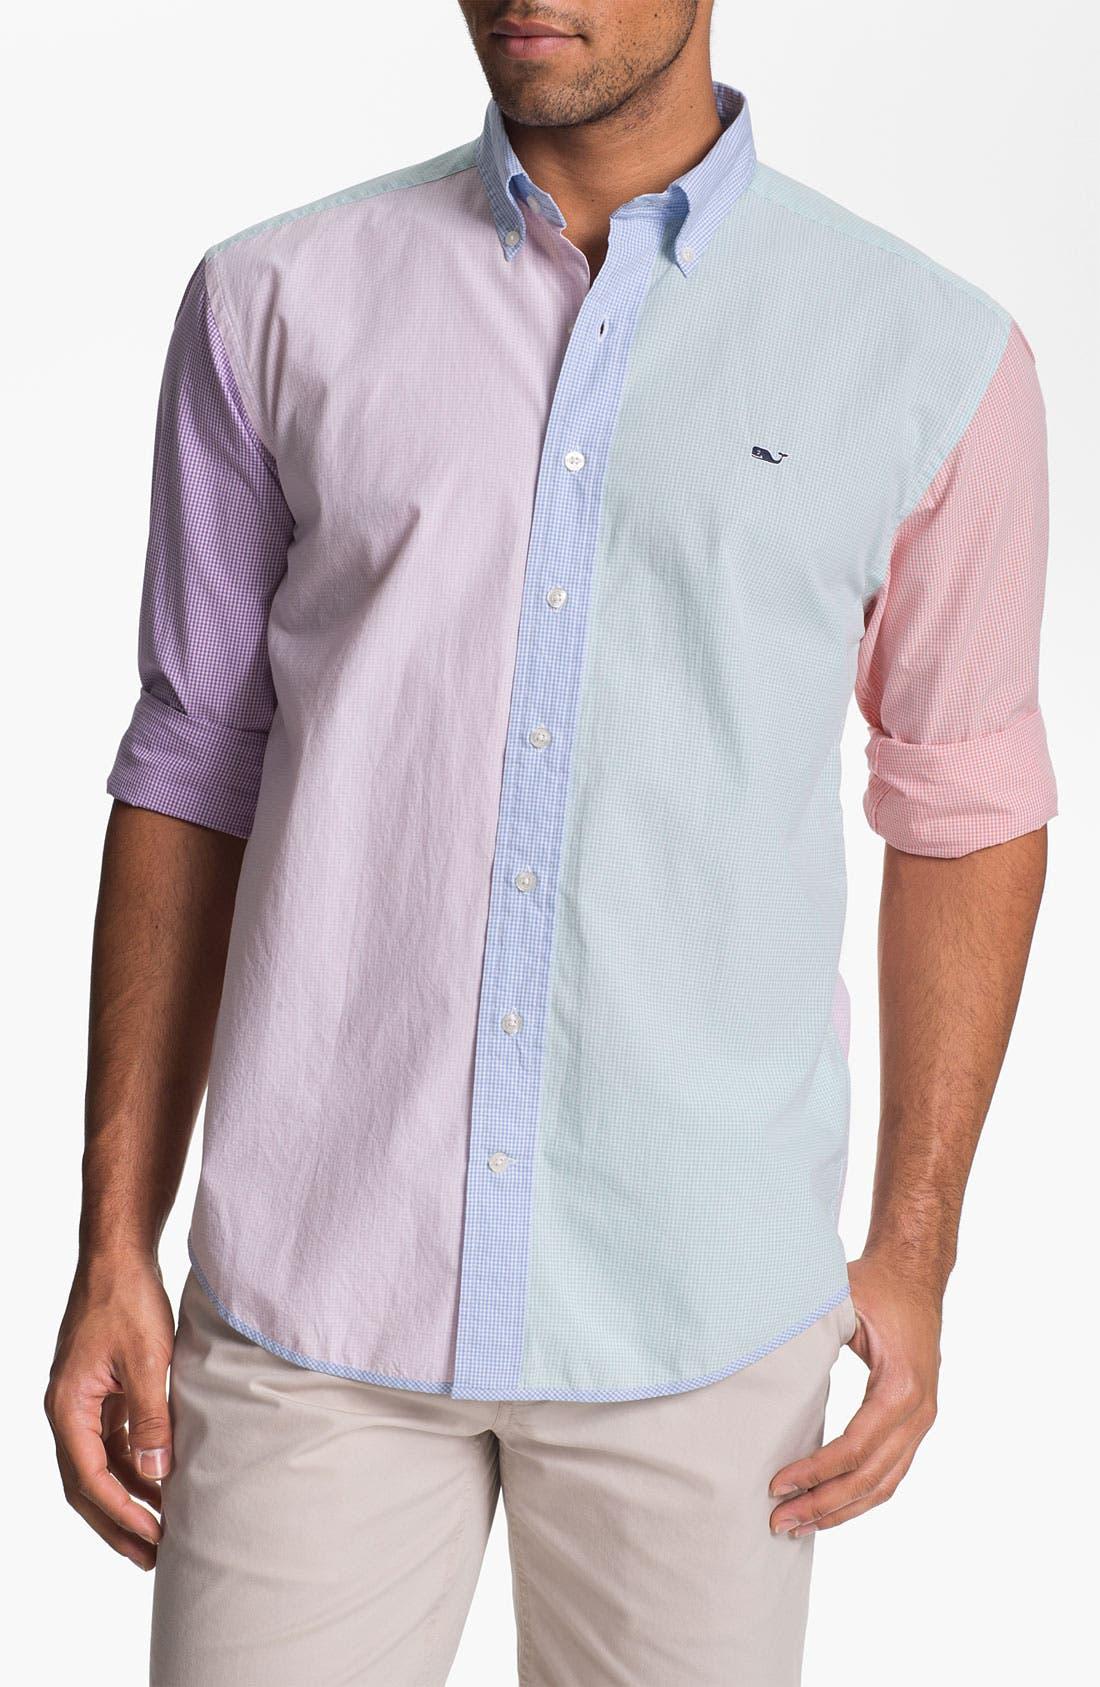 Alternate Image 1 Selected - Vineyard Vines 'Party Antigua' Regular Fit Sport Shirt